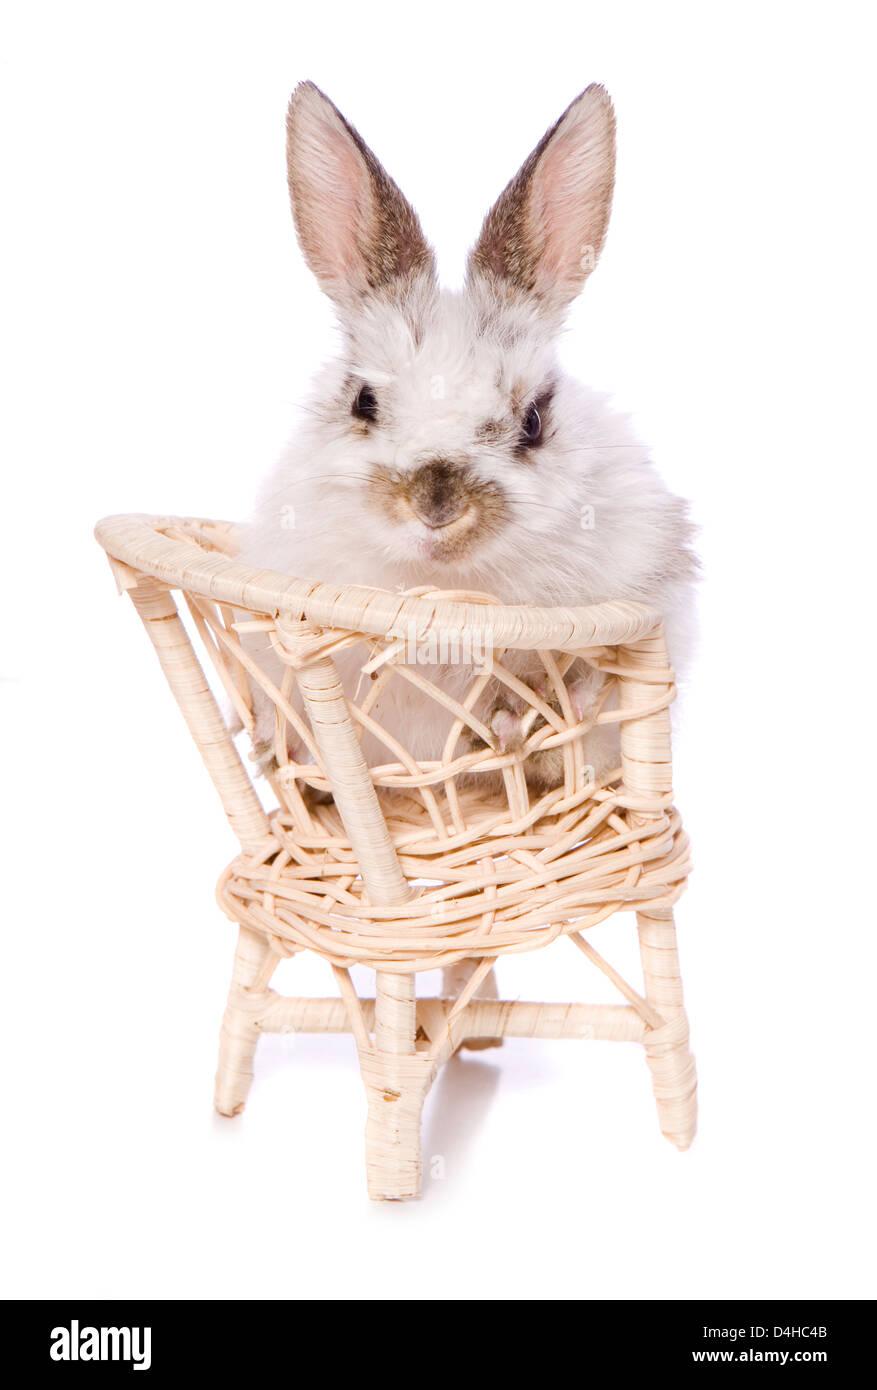 single baby rabbit sitting on a chair studio cutout - Stock Image